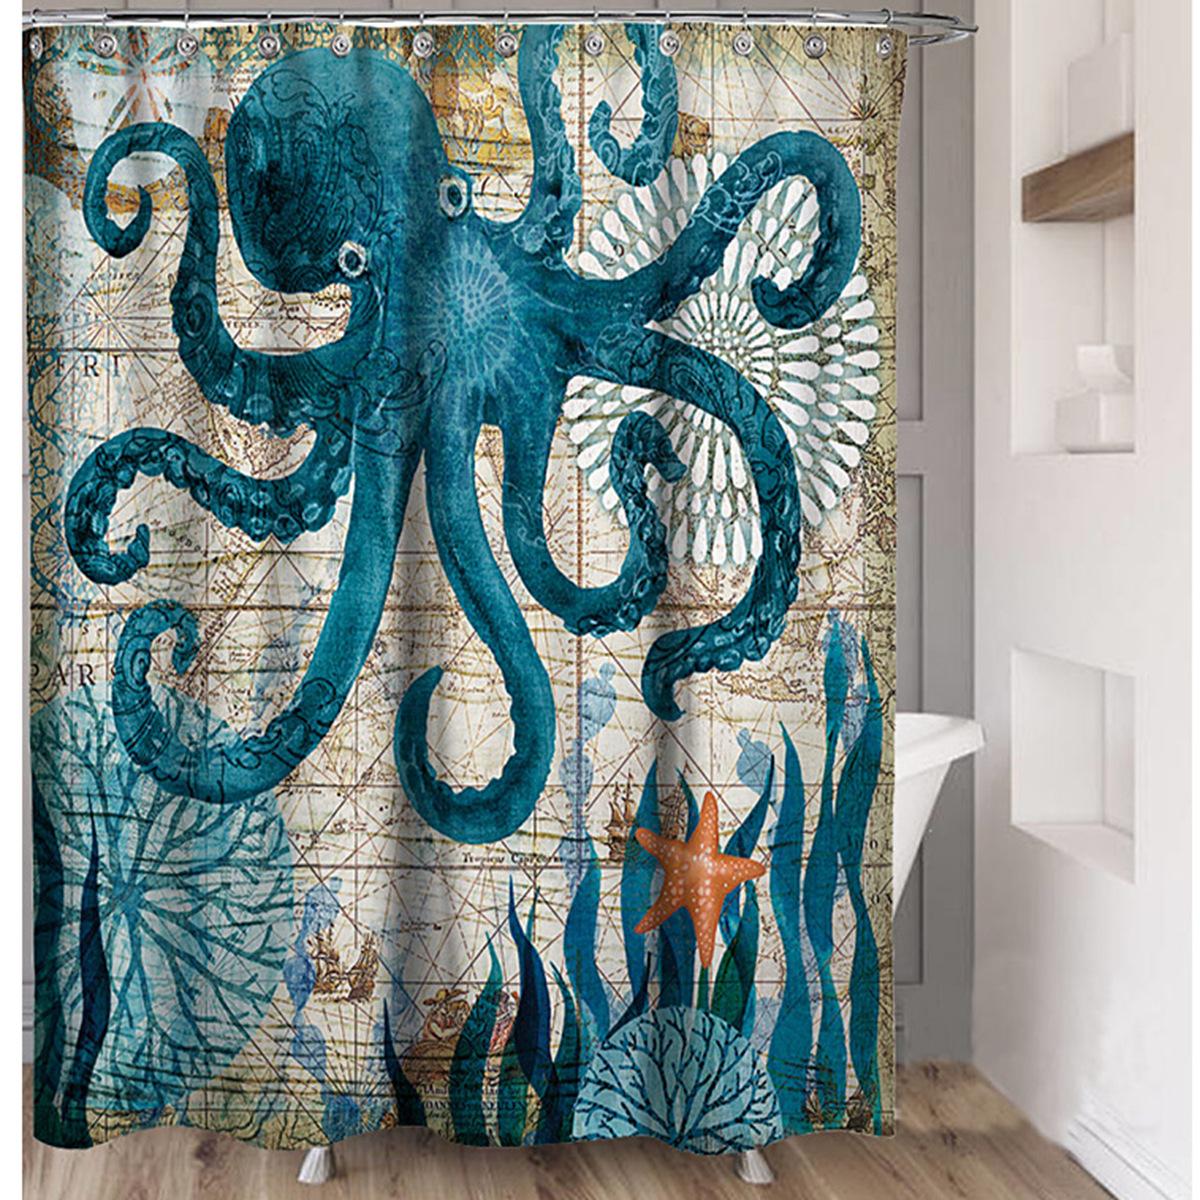 octopus shower curtain with hooks bathroom shower curtain durable ocean bath curtain waterproof shower curtain